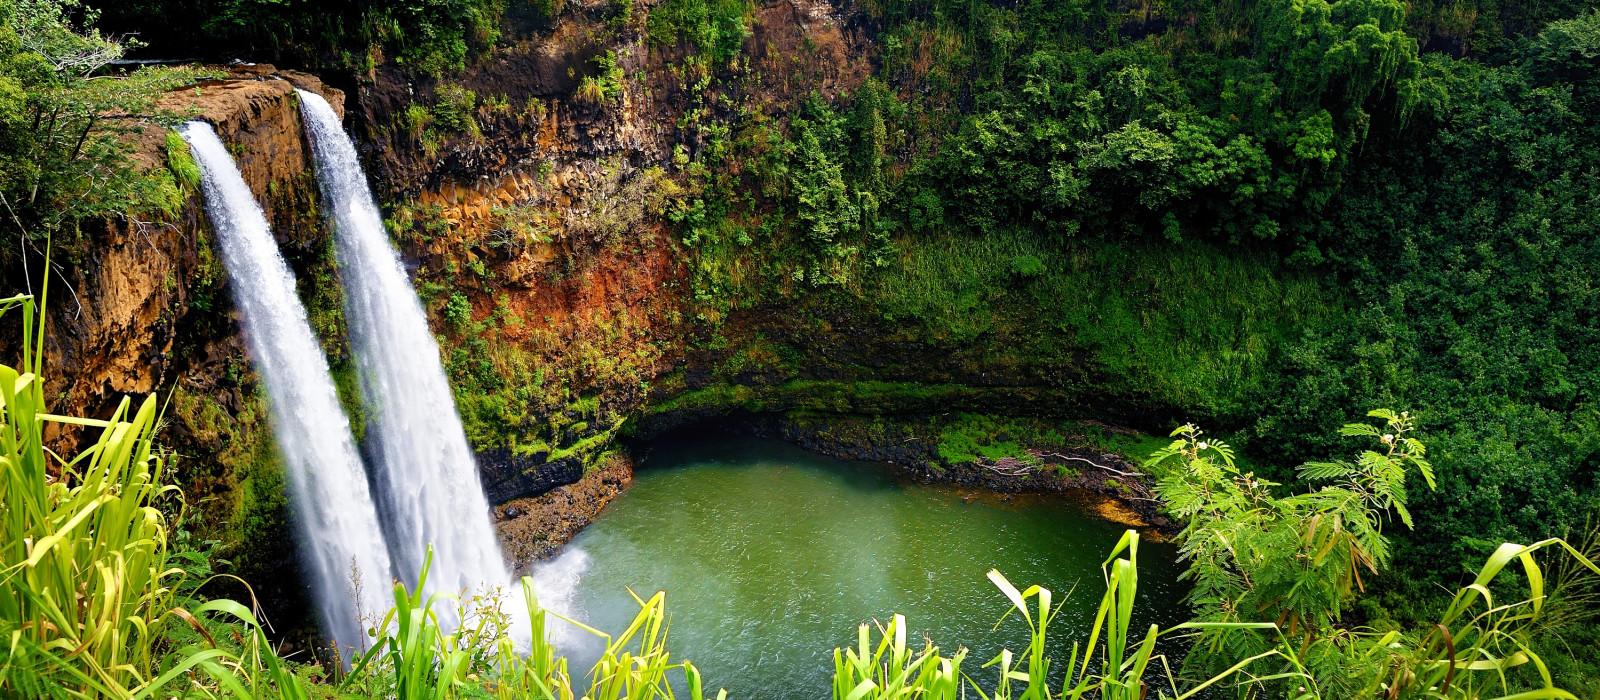 Destination Kauai Hawaii